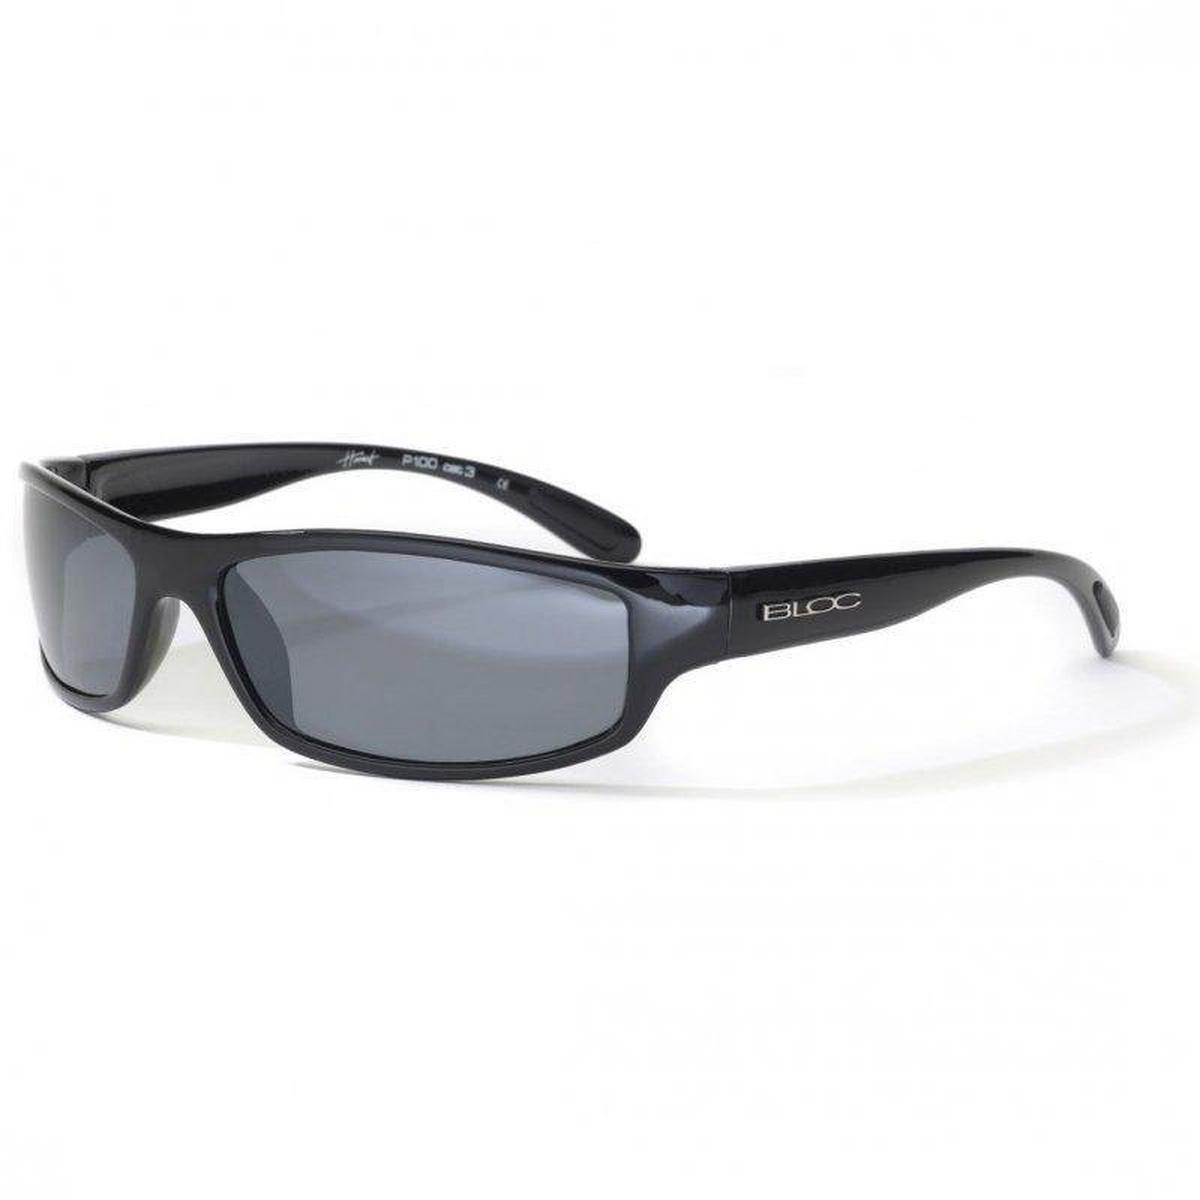 Bloc Mens Hornet Black Sunglasses